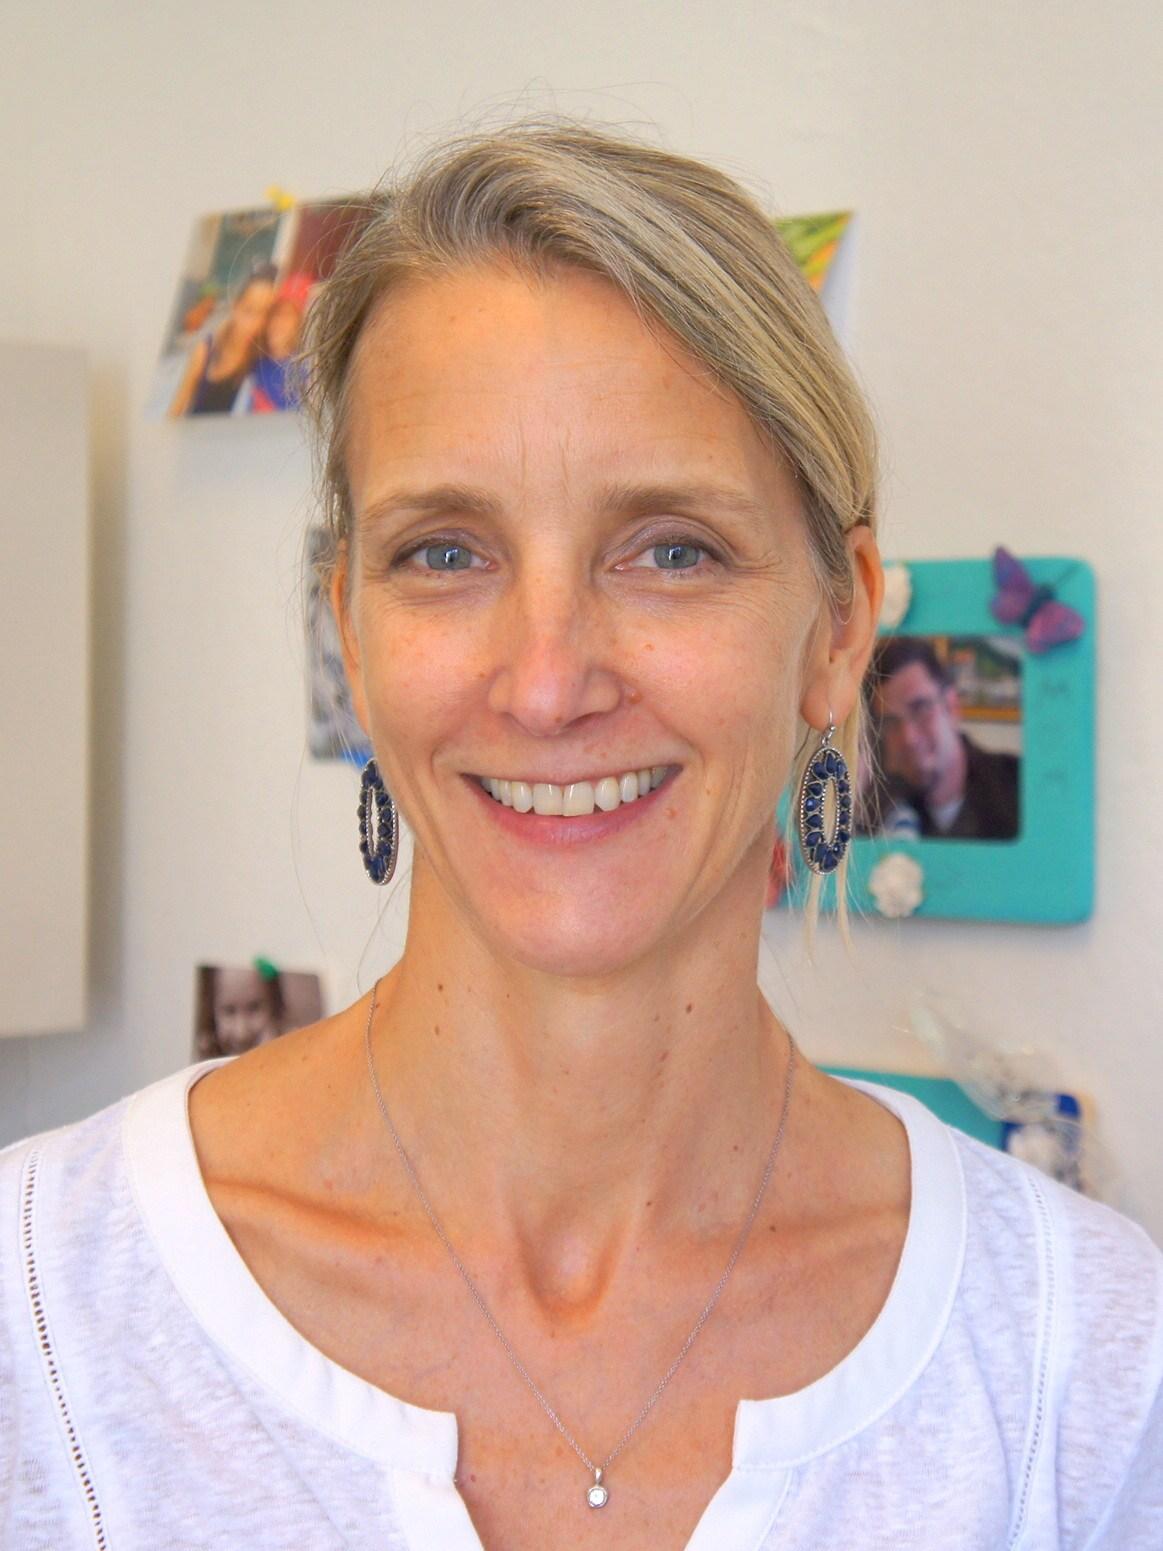 Anja Bresler